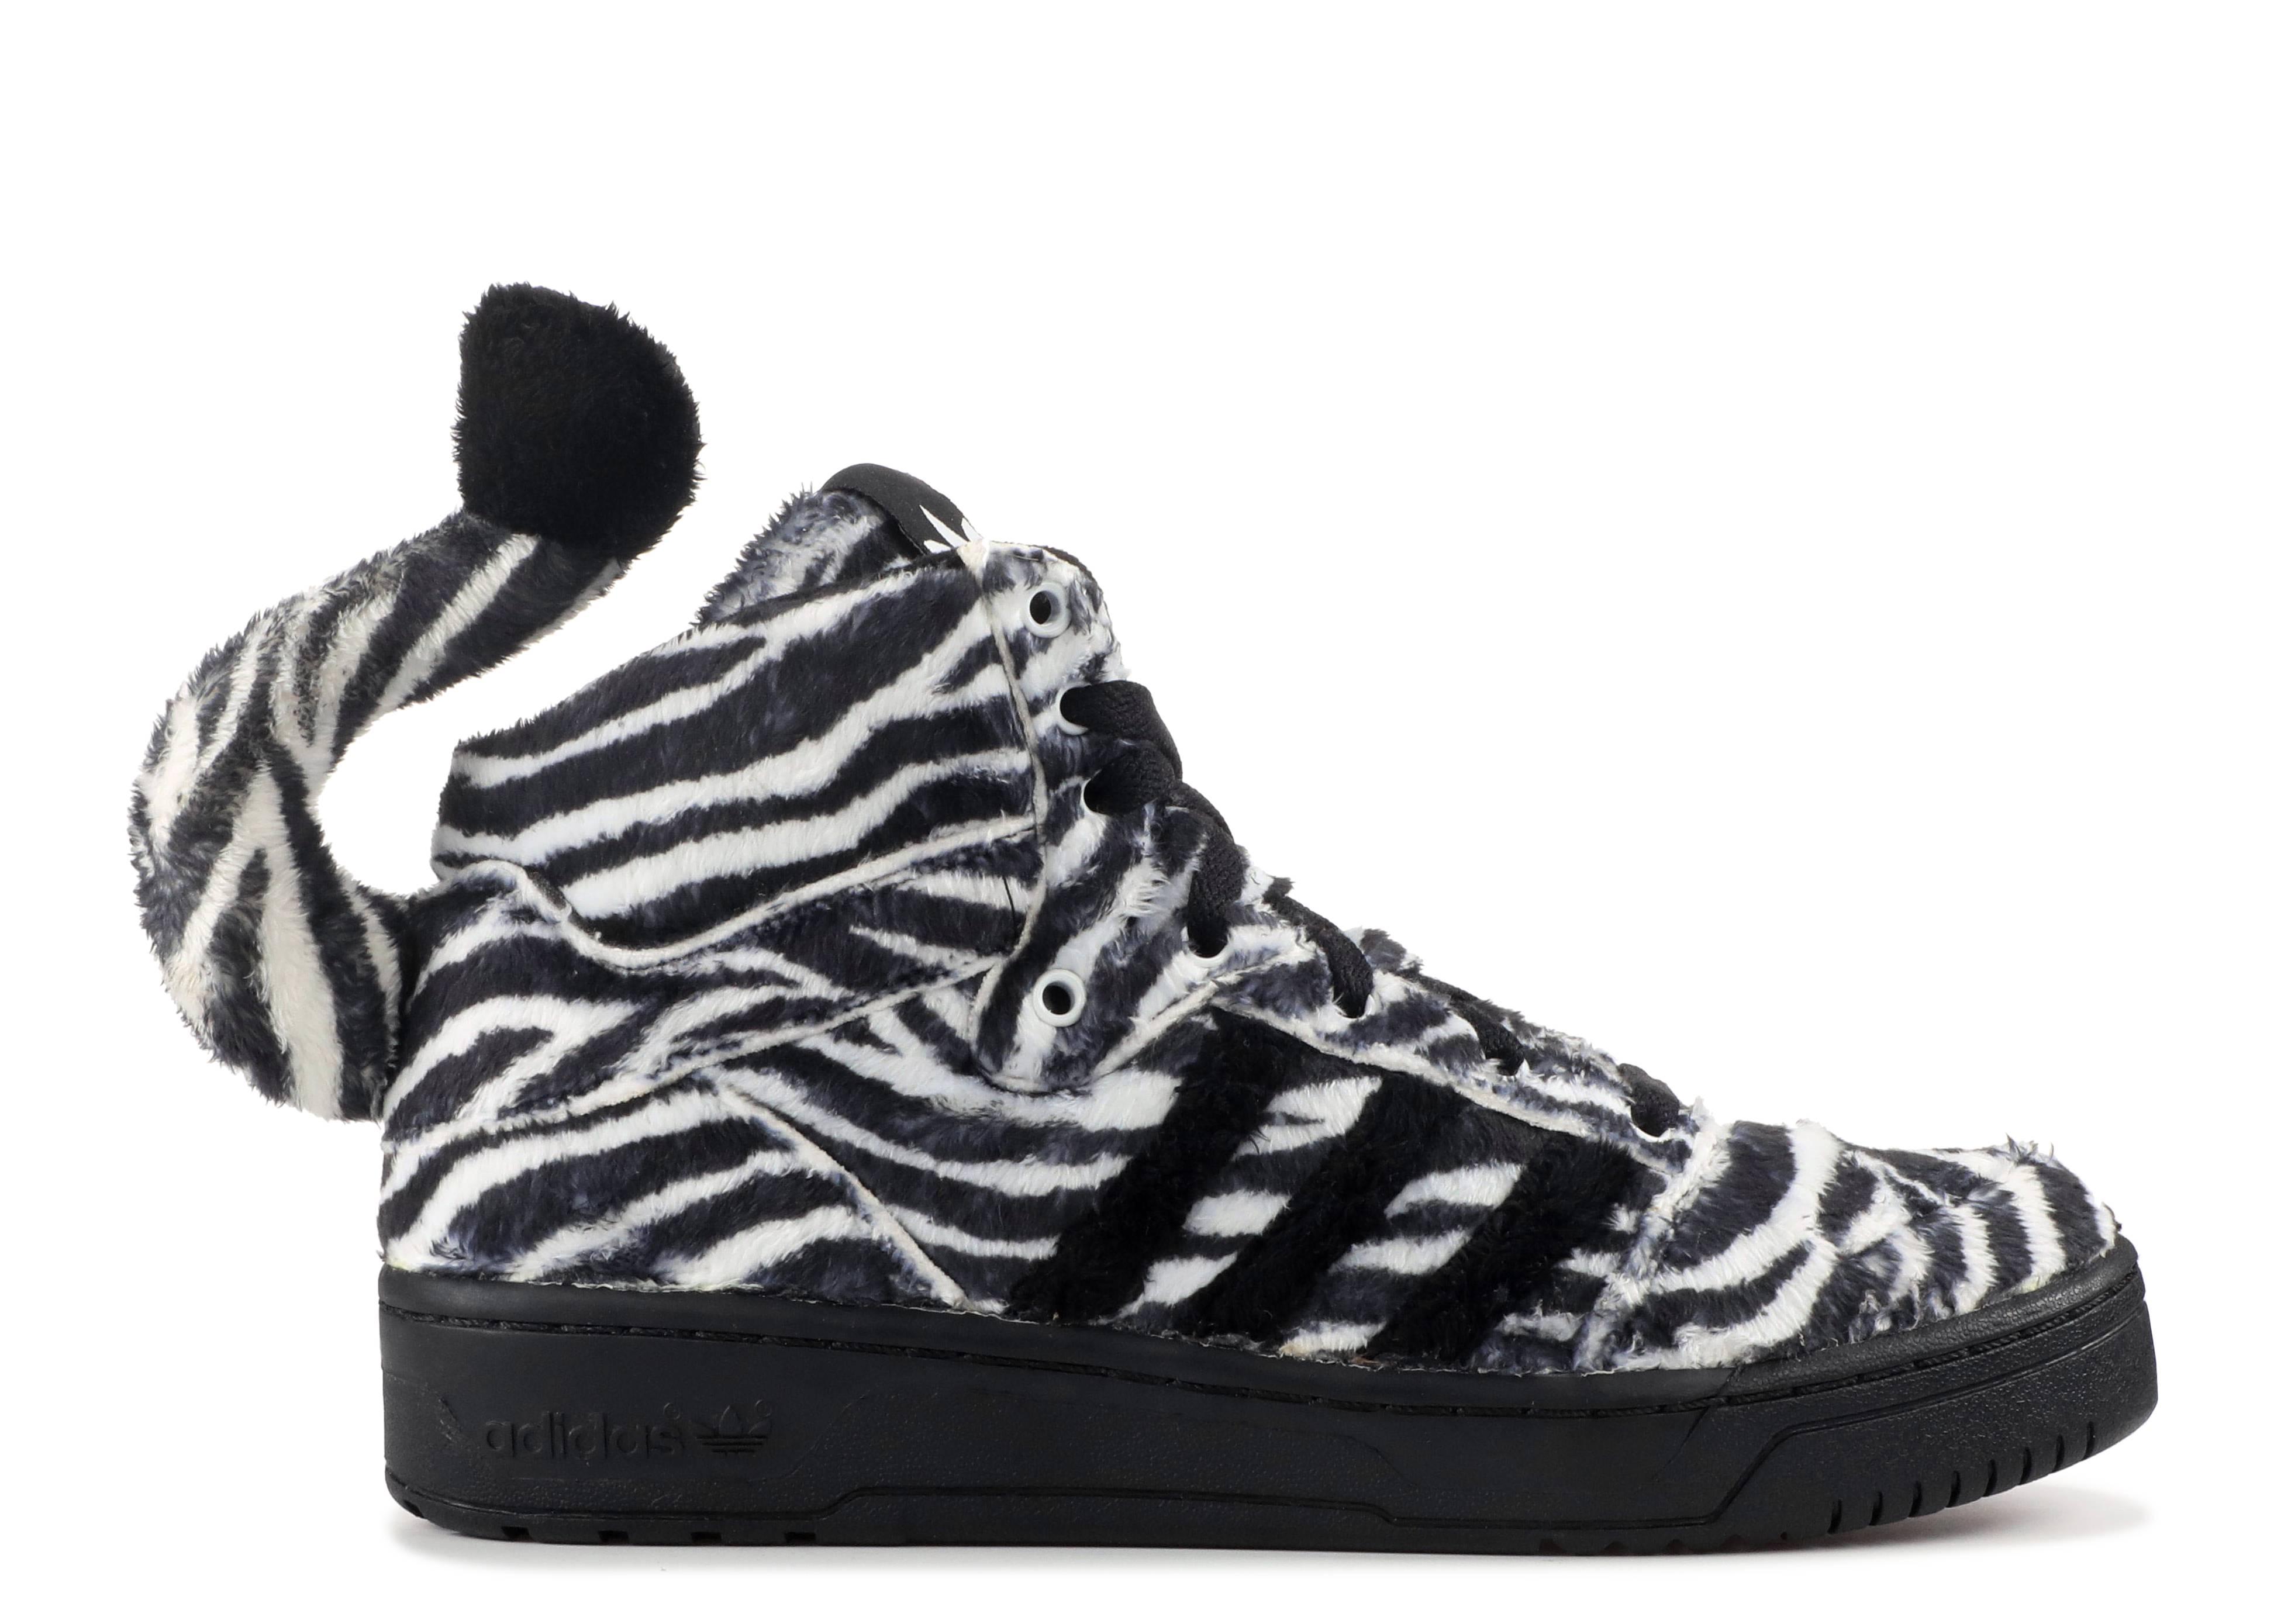 Js zebra adidas g95749 nero1 / runwht / blk1 volo club